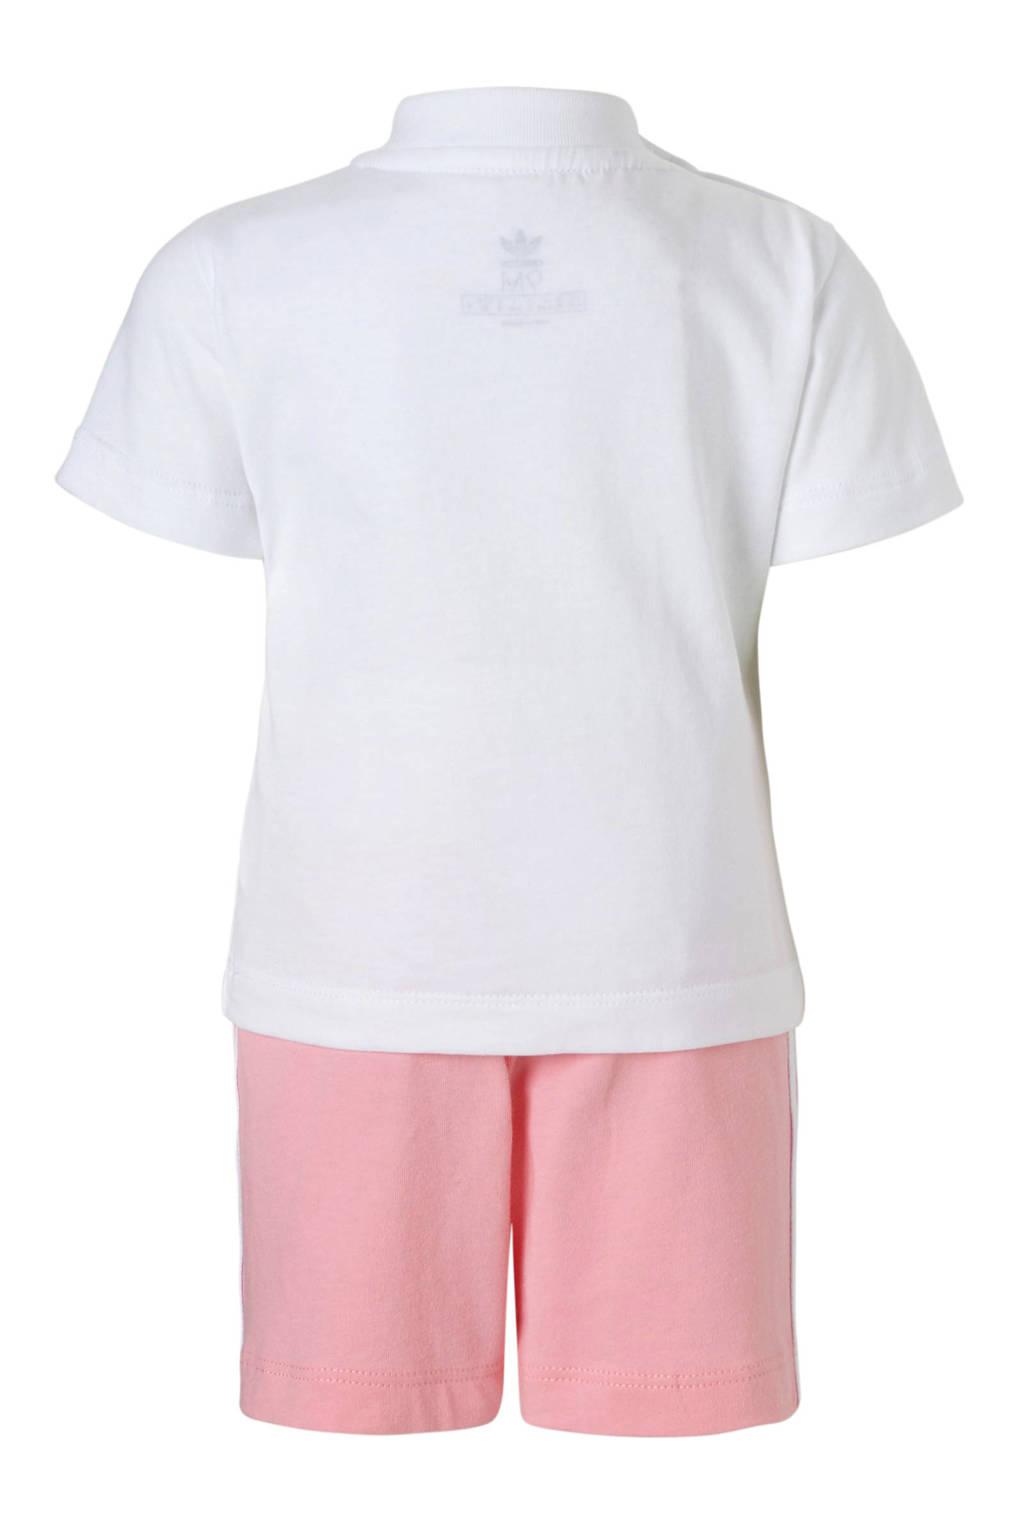 adidas Originals shirt + short roze/wit, Roze/wit